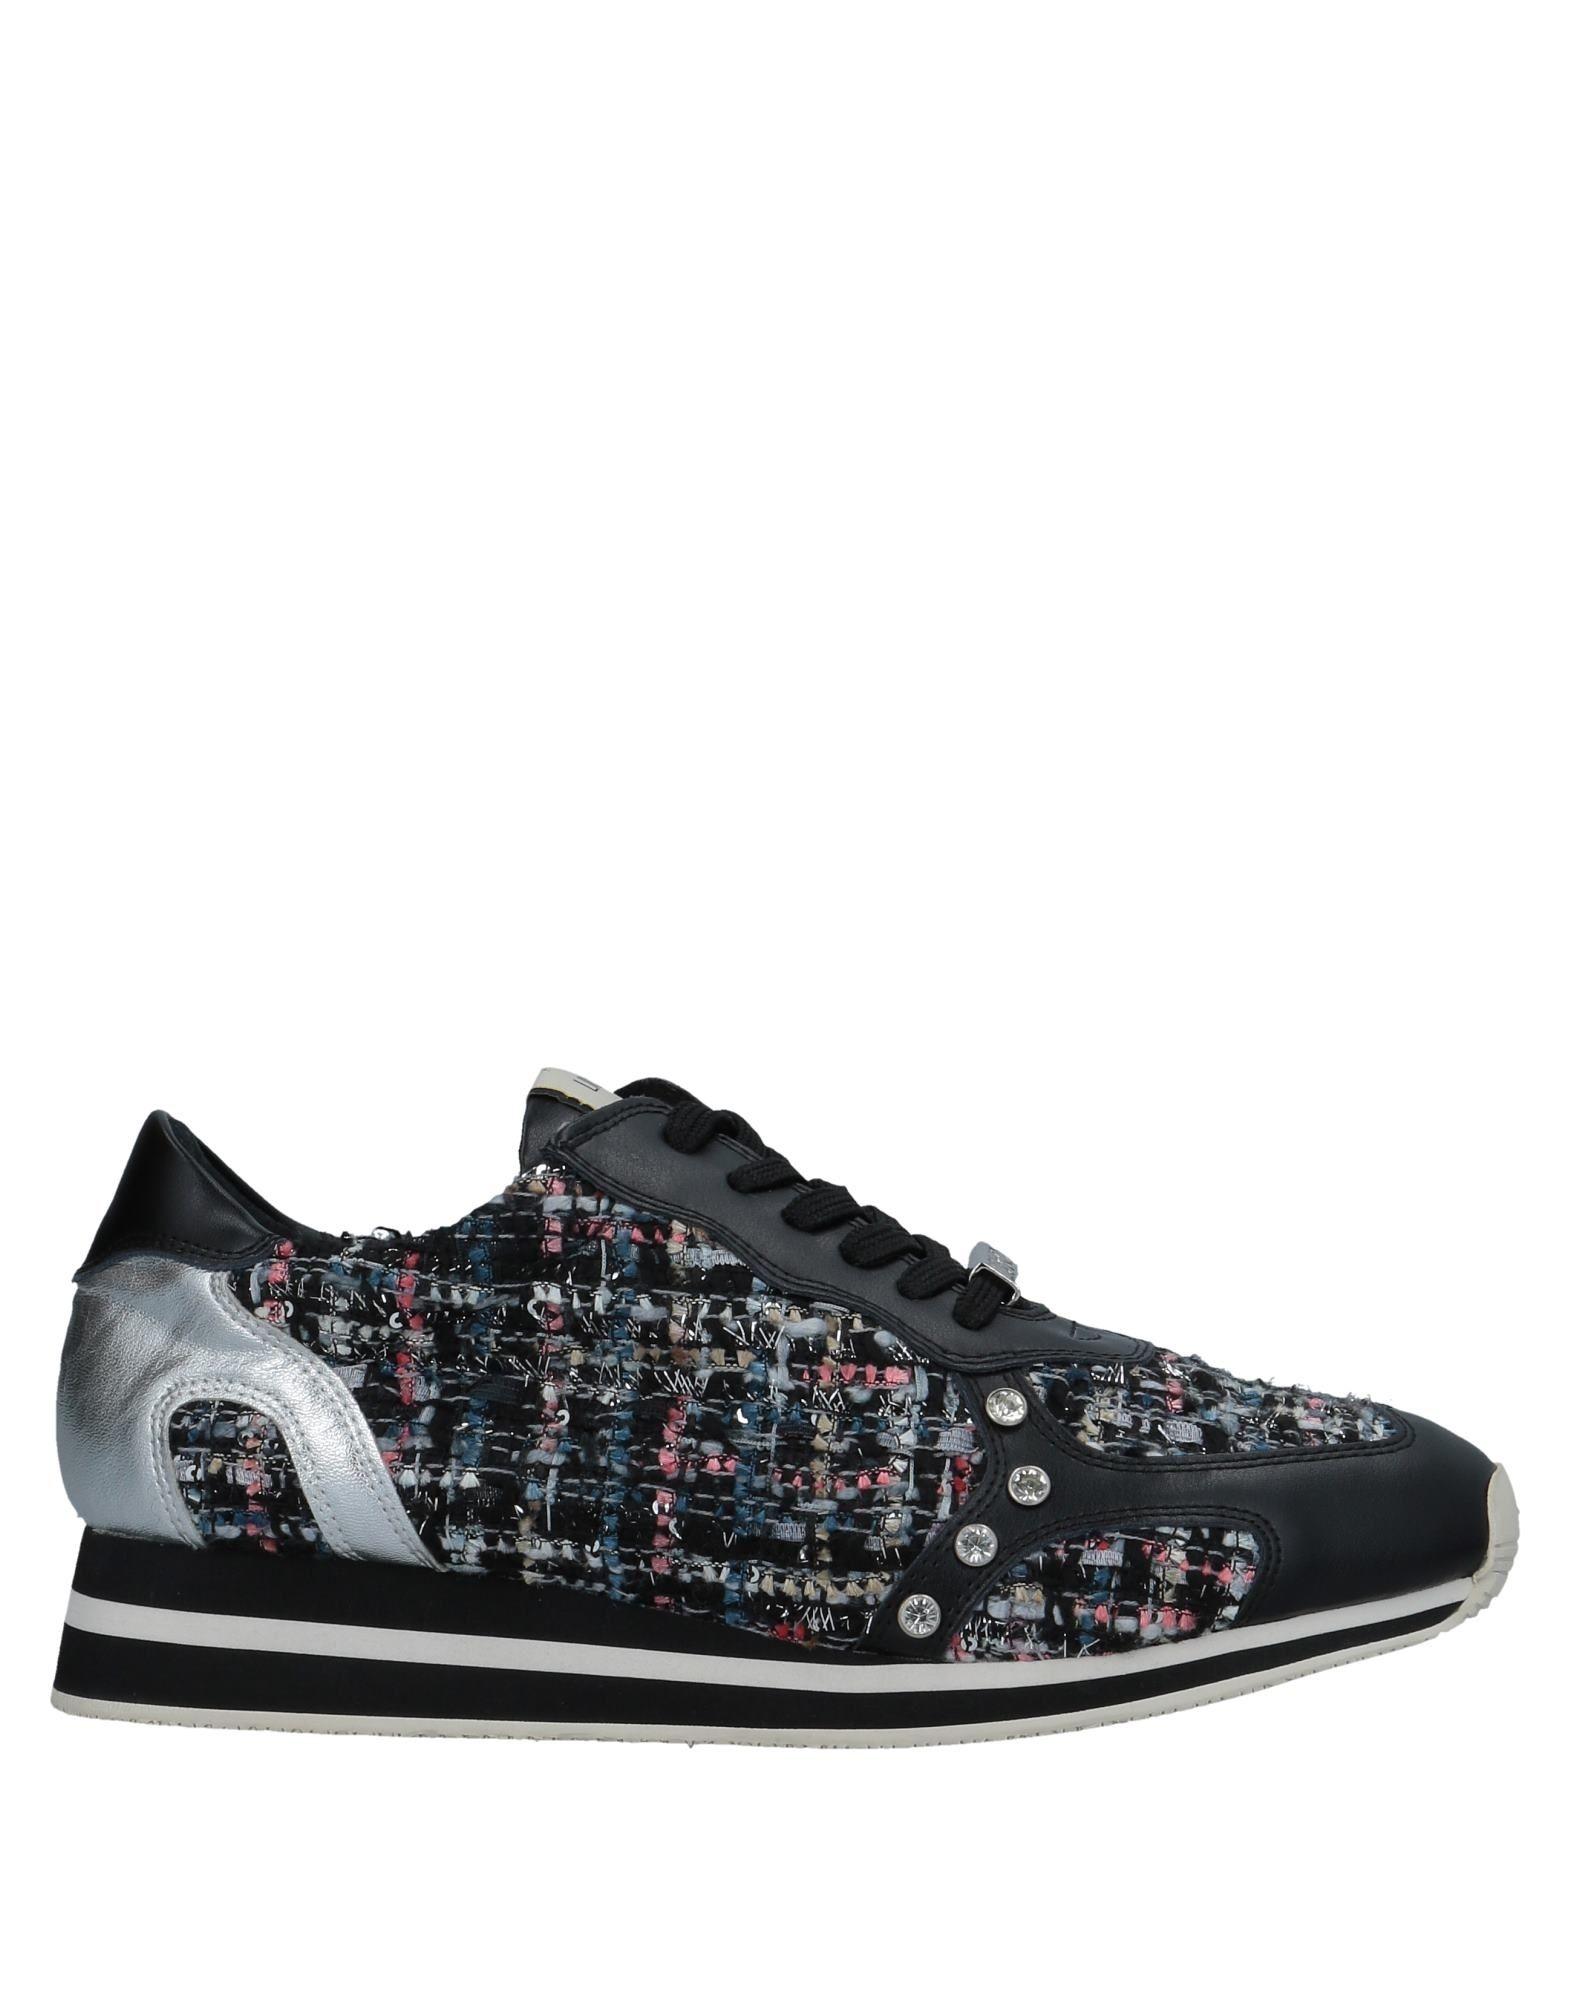 Liu •Jo Sneakers Damen  11522420VP Gute Qualität beliebte Schuhe